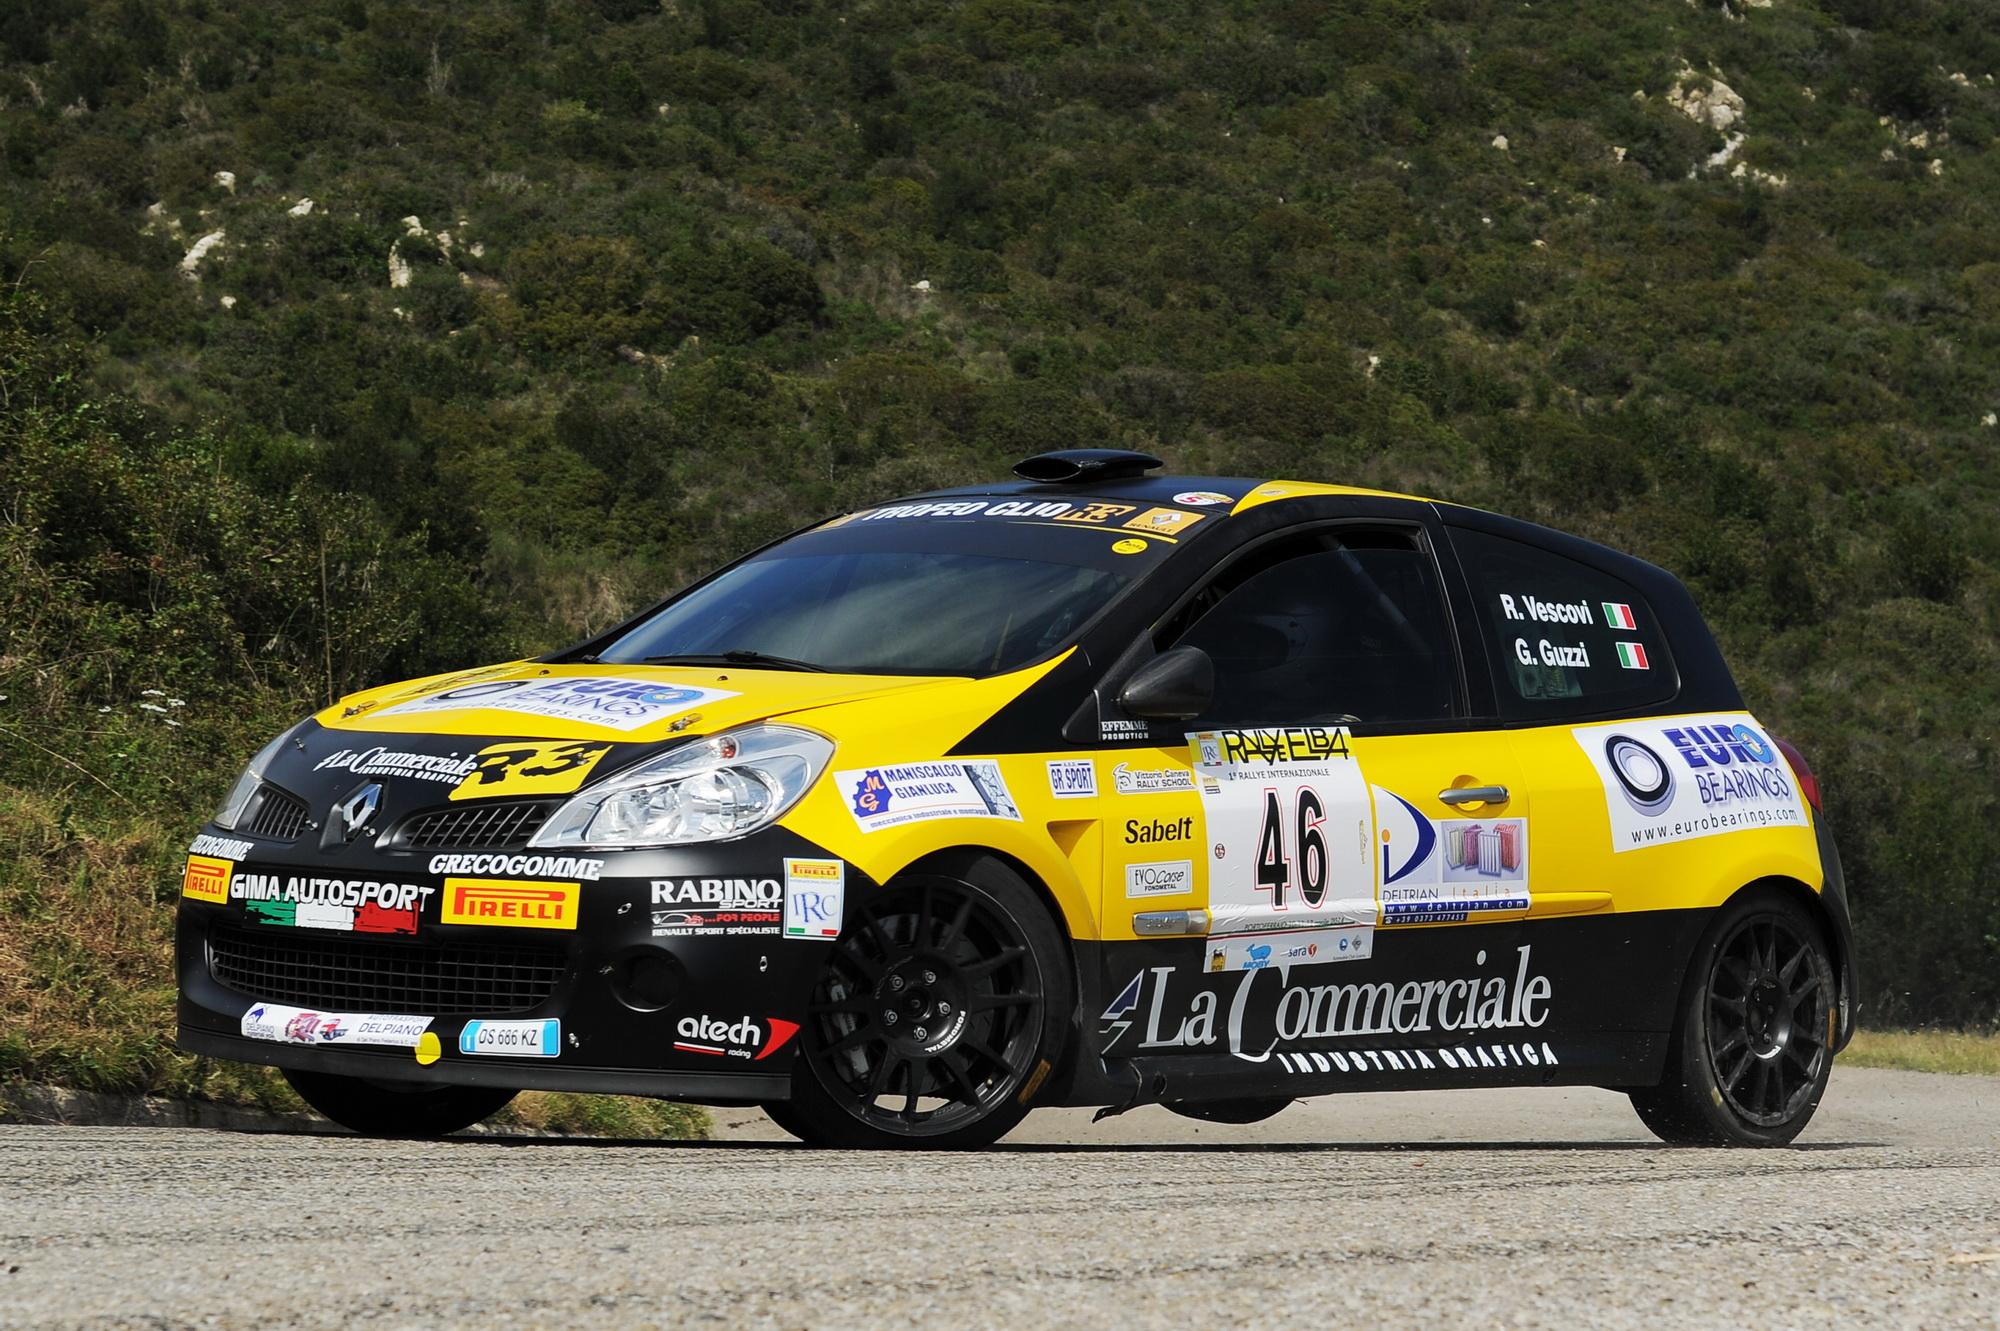 Renault: nel weekend impegno su tre fronti